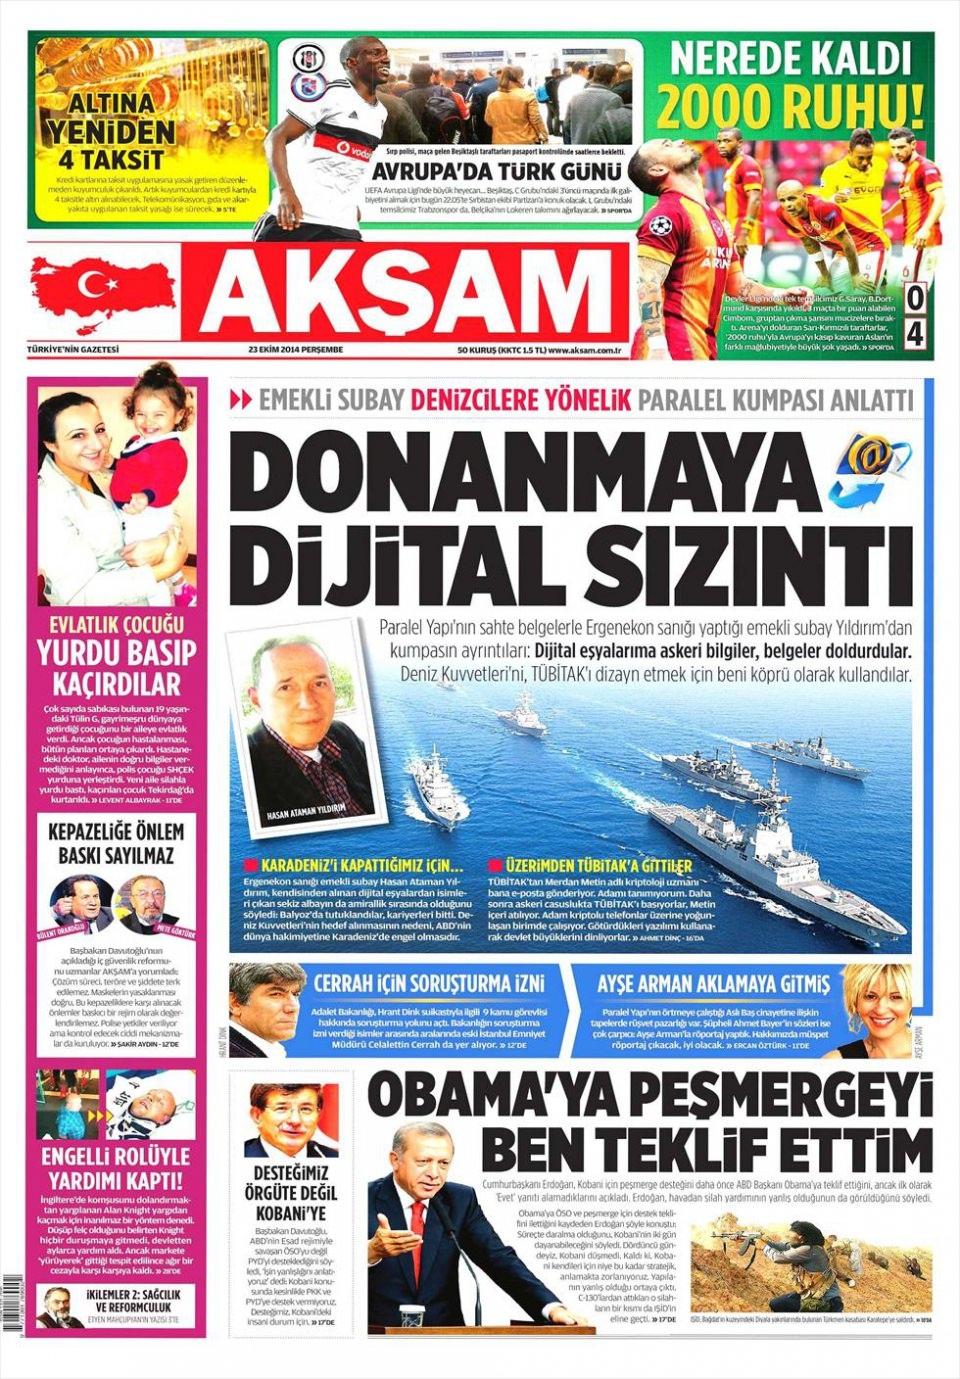 23 Ekim 2014 gazete manşetleri 1